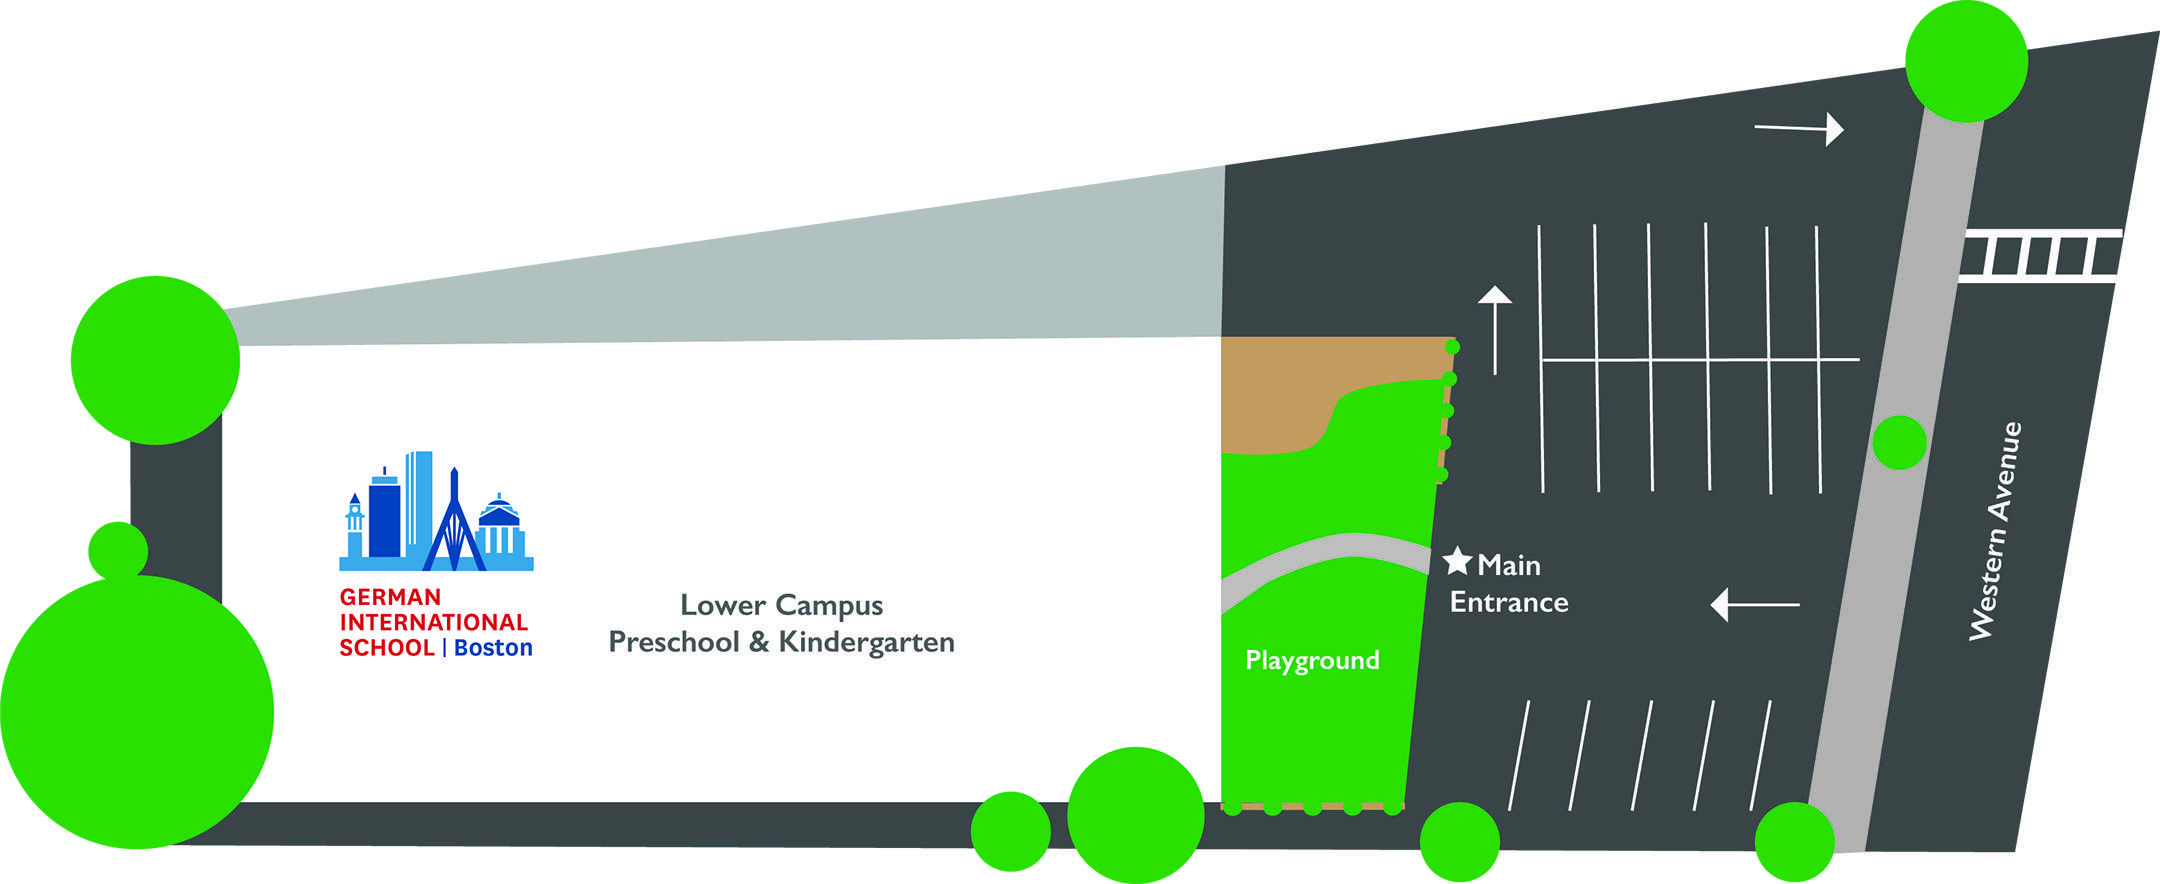 Map of Lower Campus of German International School Boston